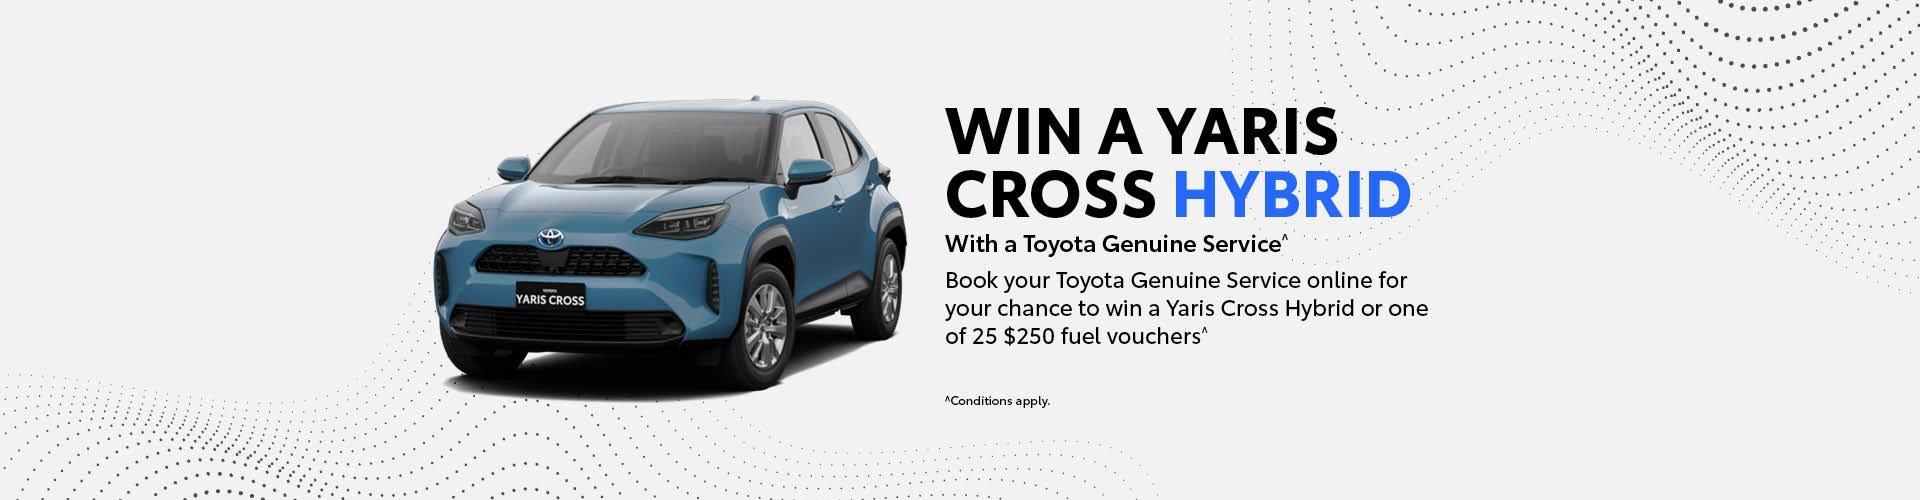 Traralgon Toyota - Win a Yaris Cross